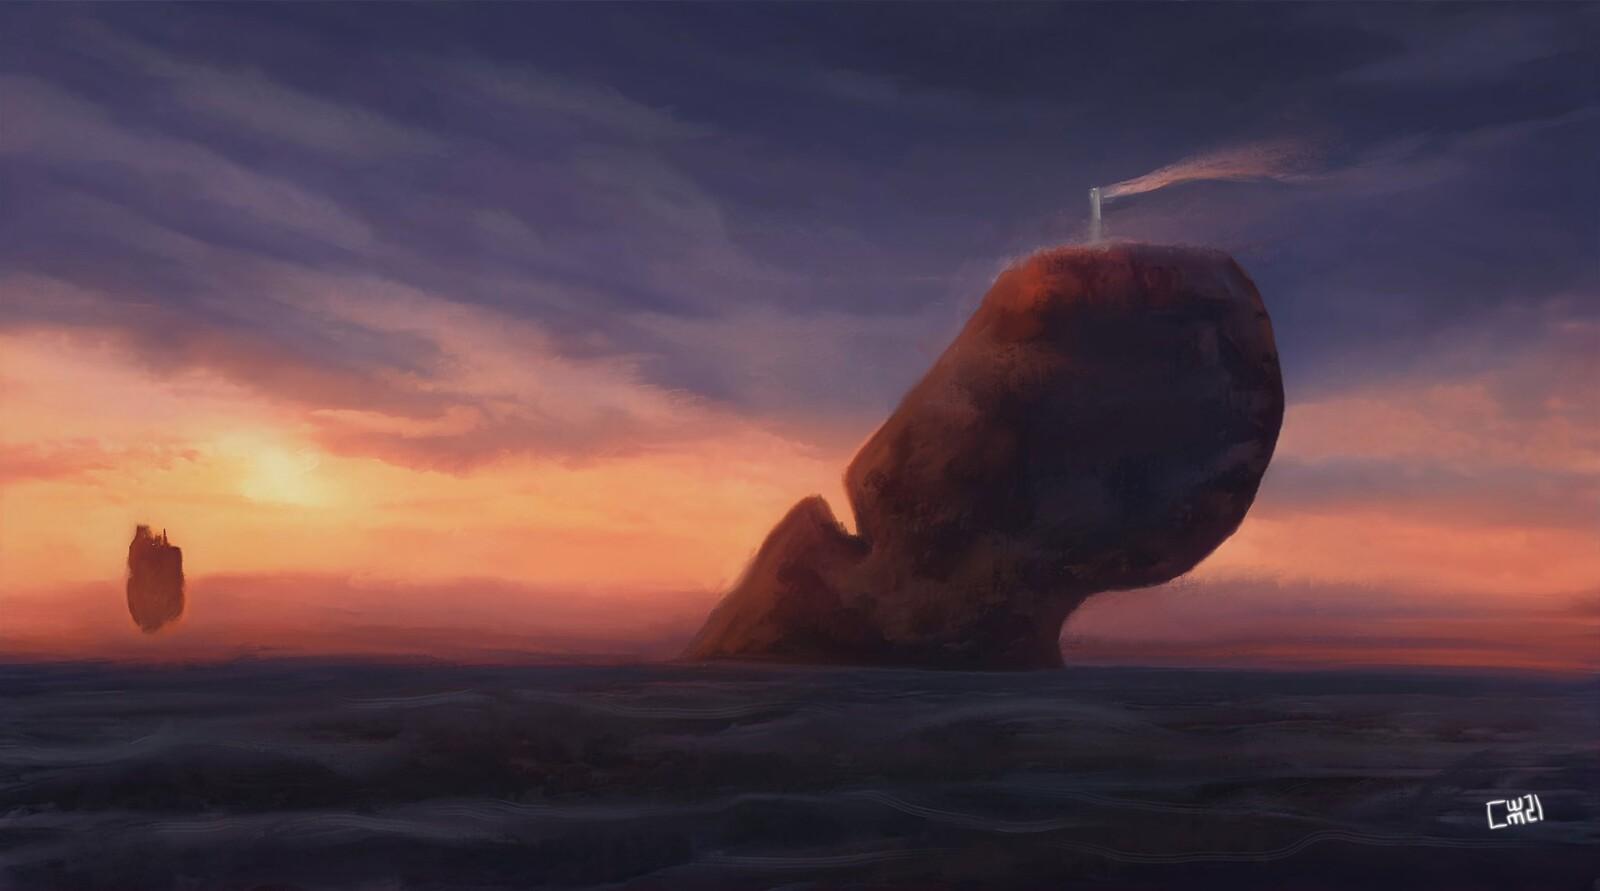 The Warden's Rock